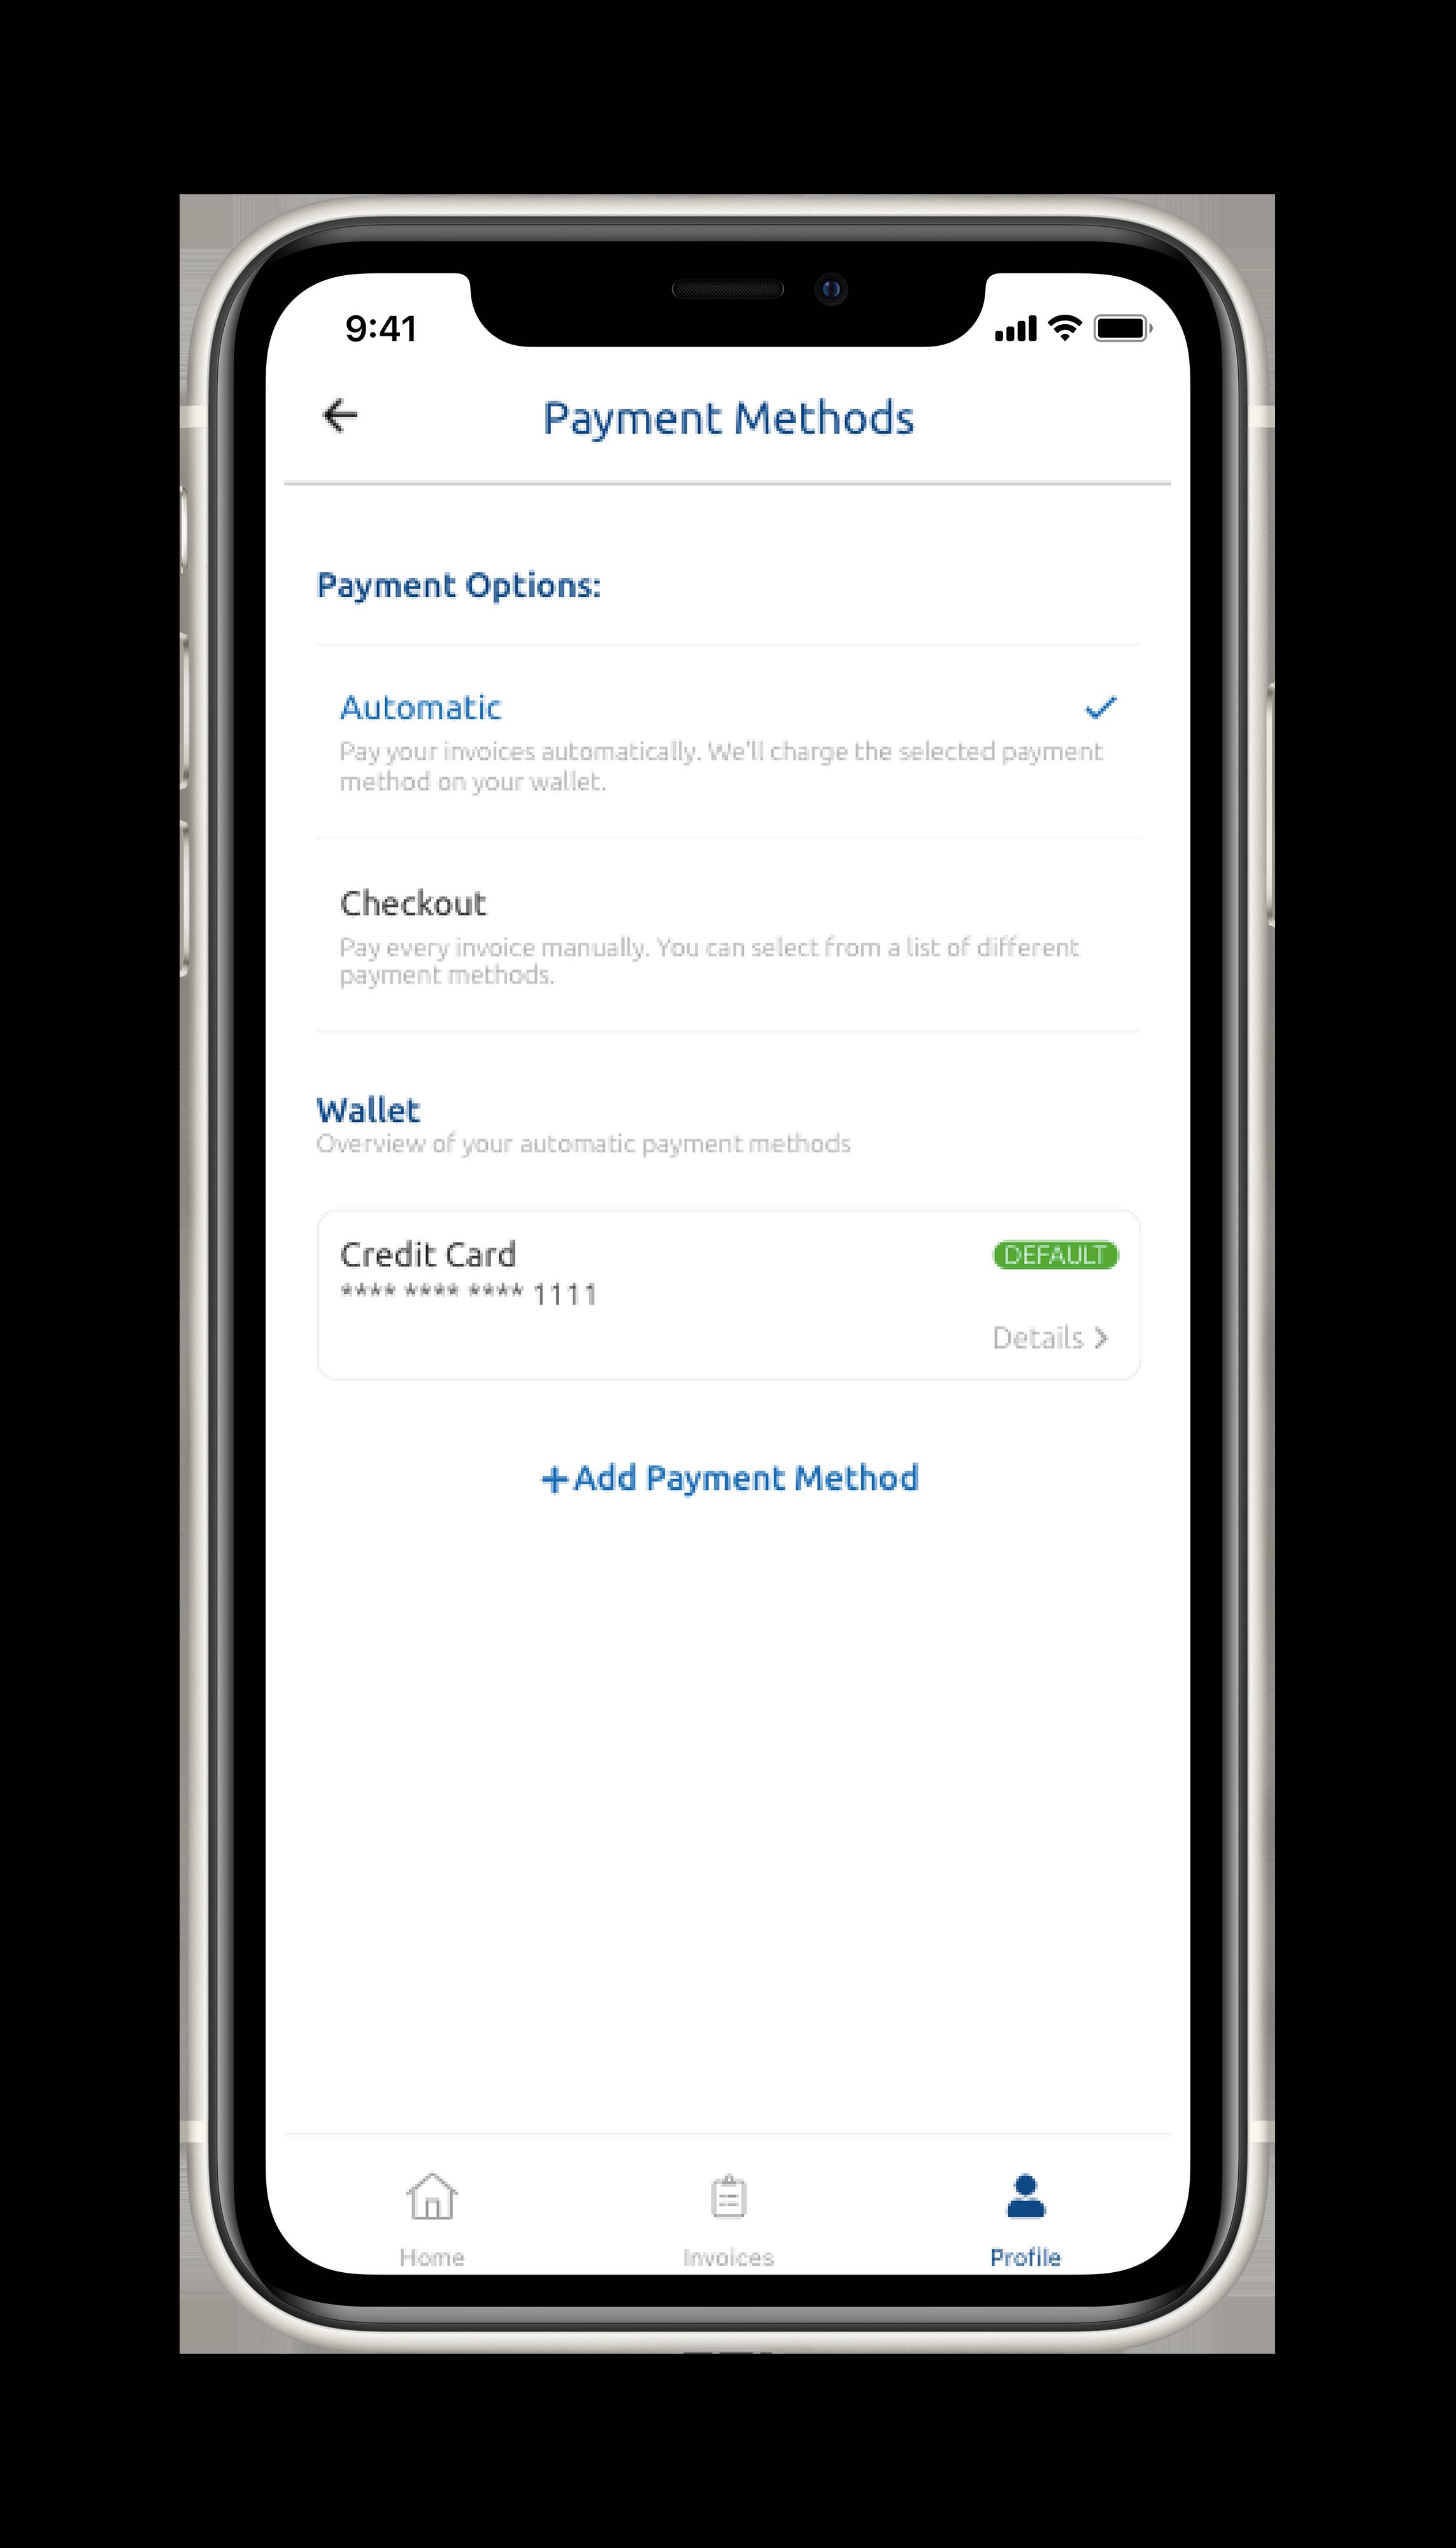 WeWash App Payment Methods